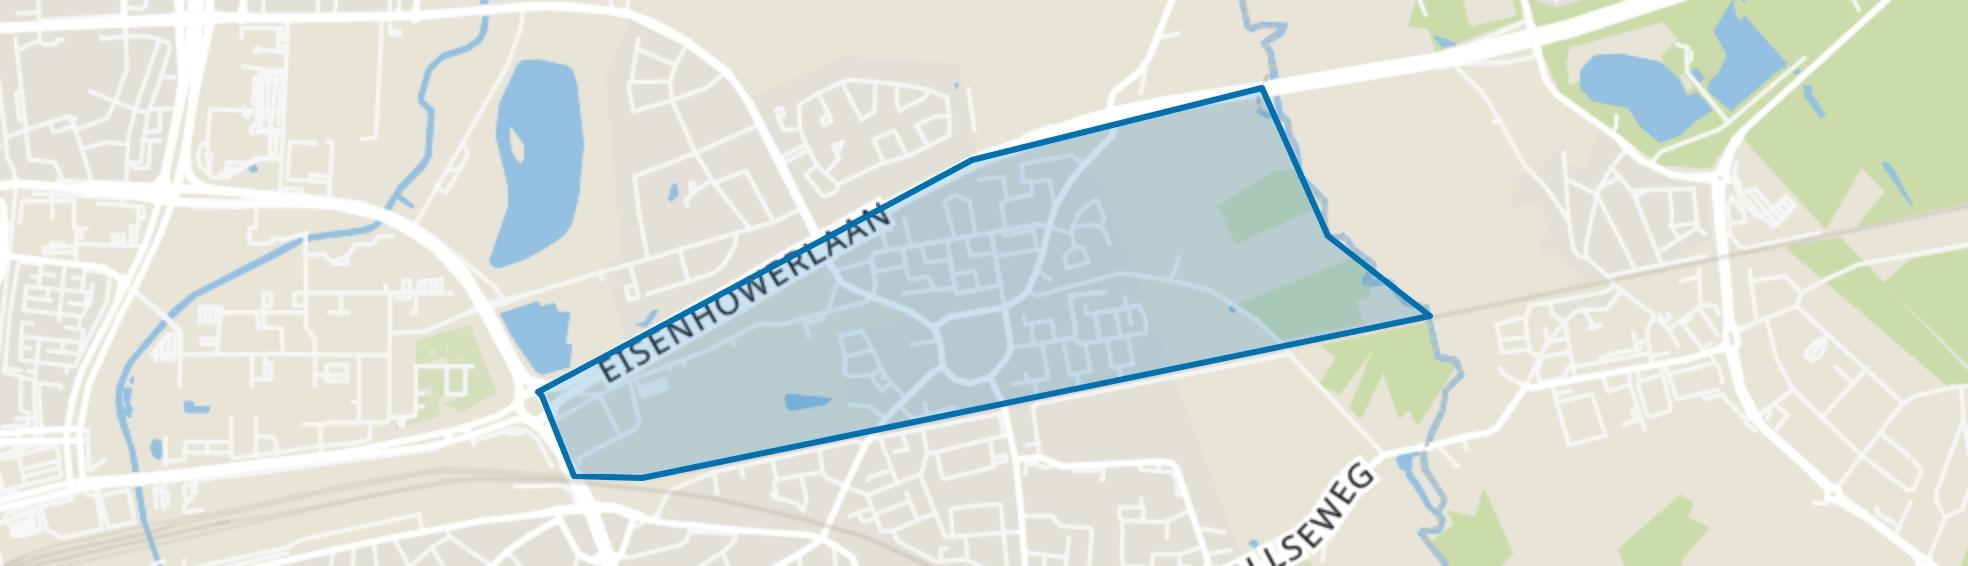 't Hofke, Eindhoven map